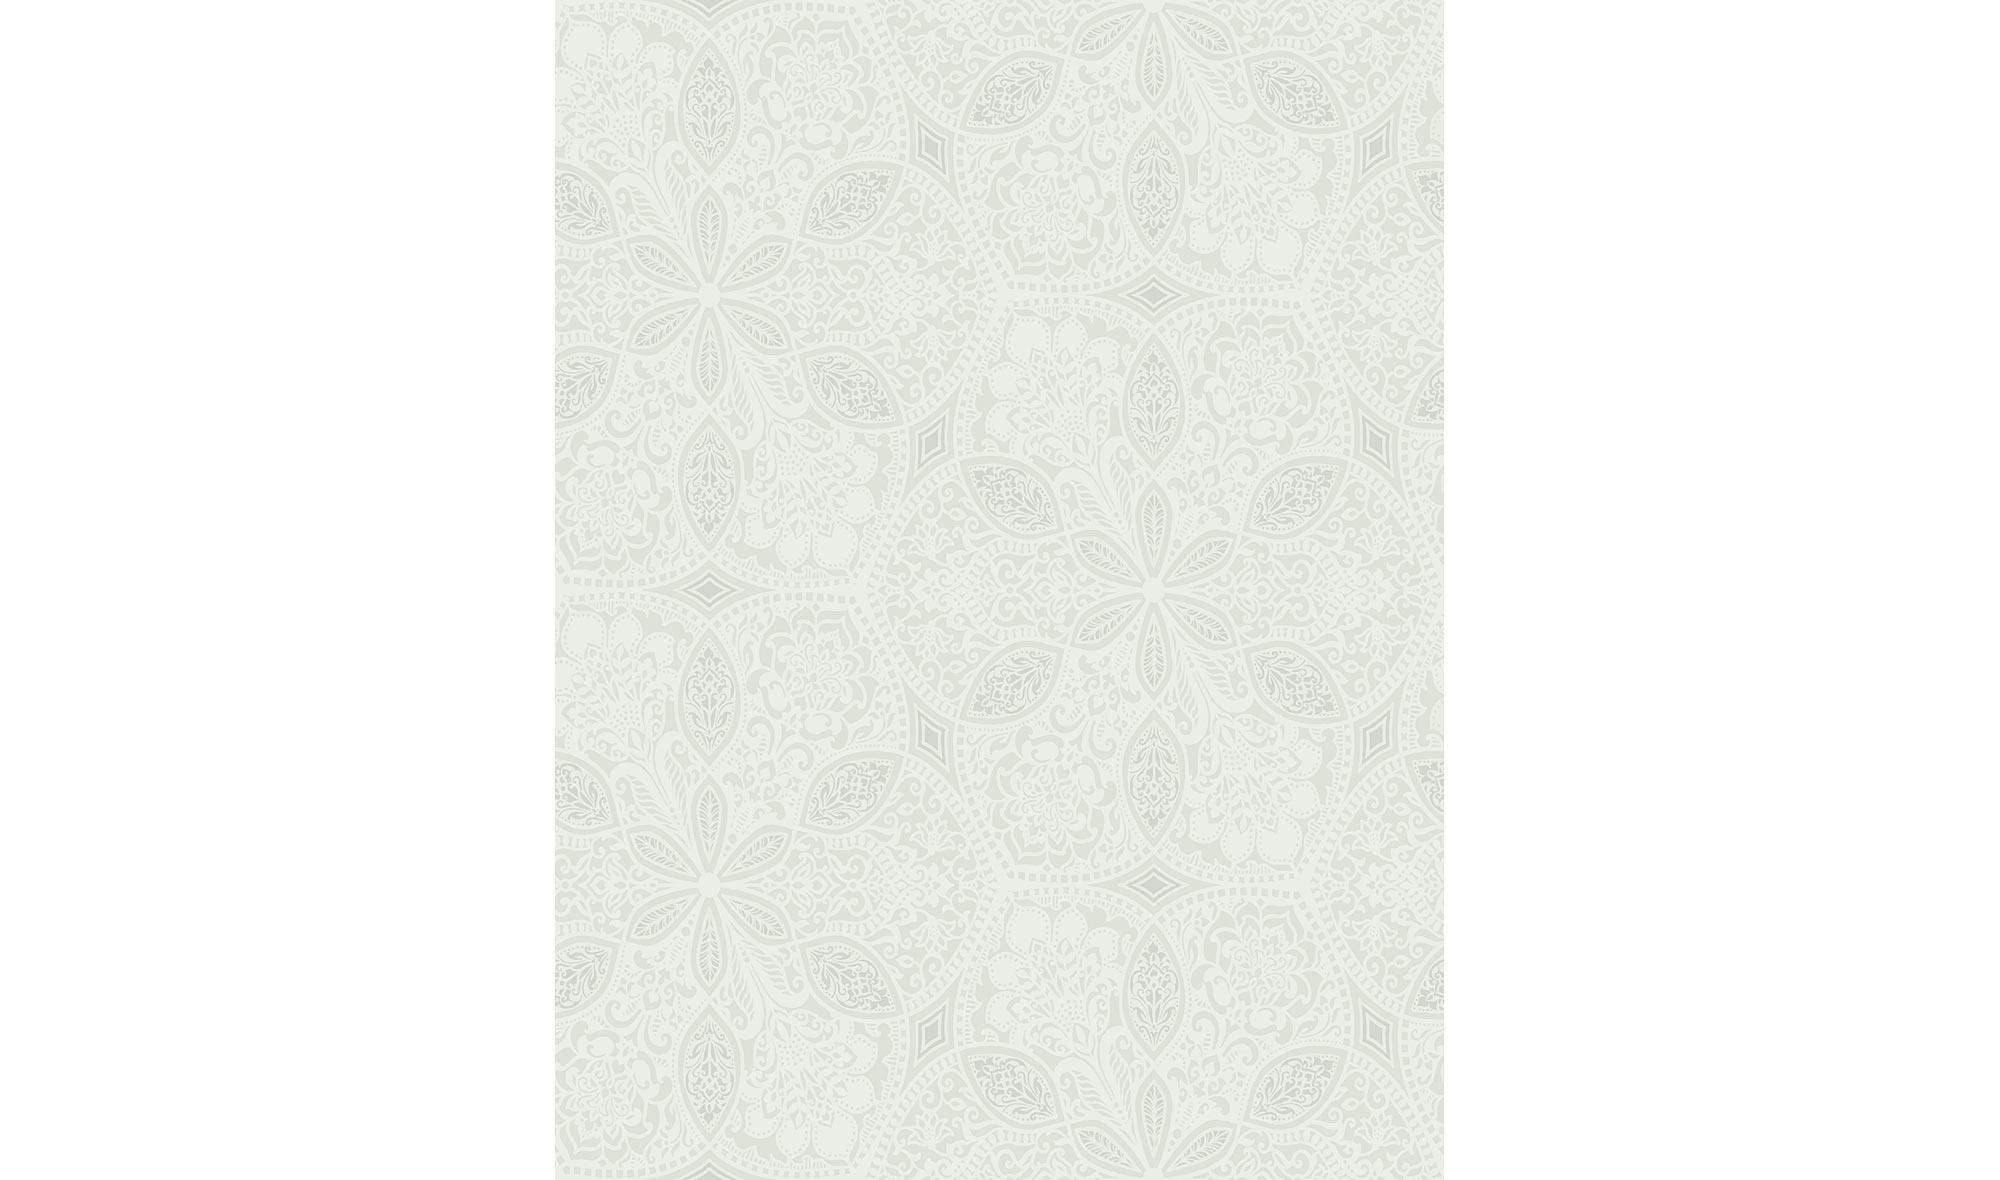 Rollo de papel pintado motivo floral gris en for Papel pintado muebles